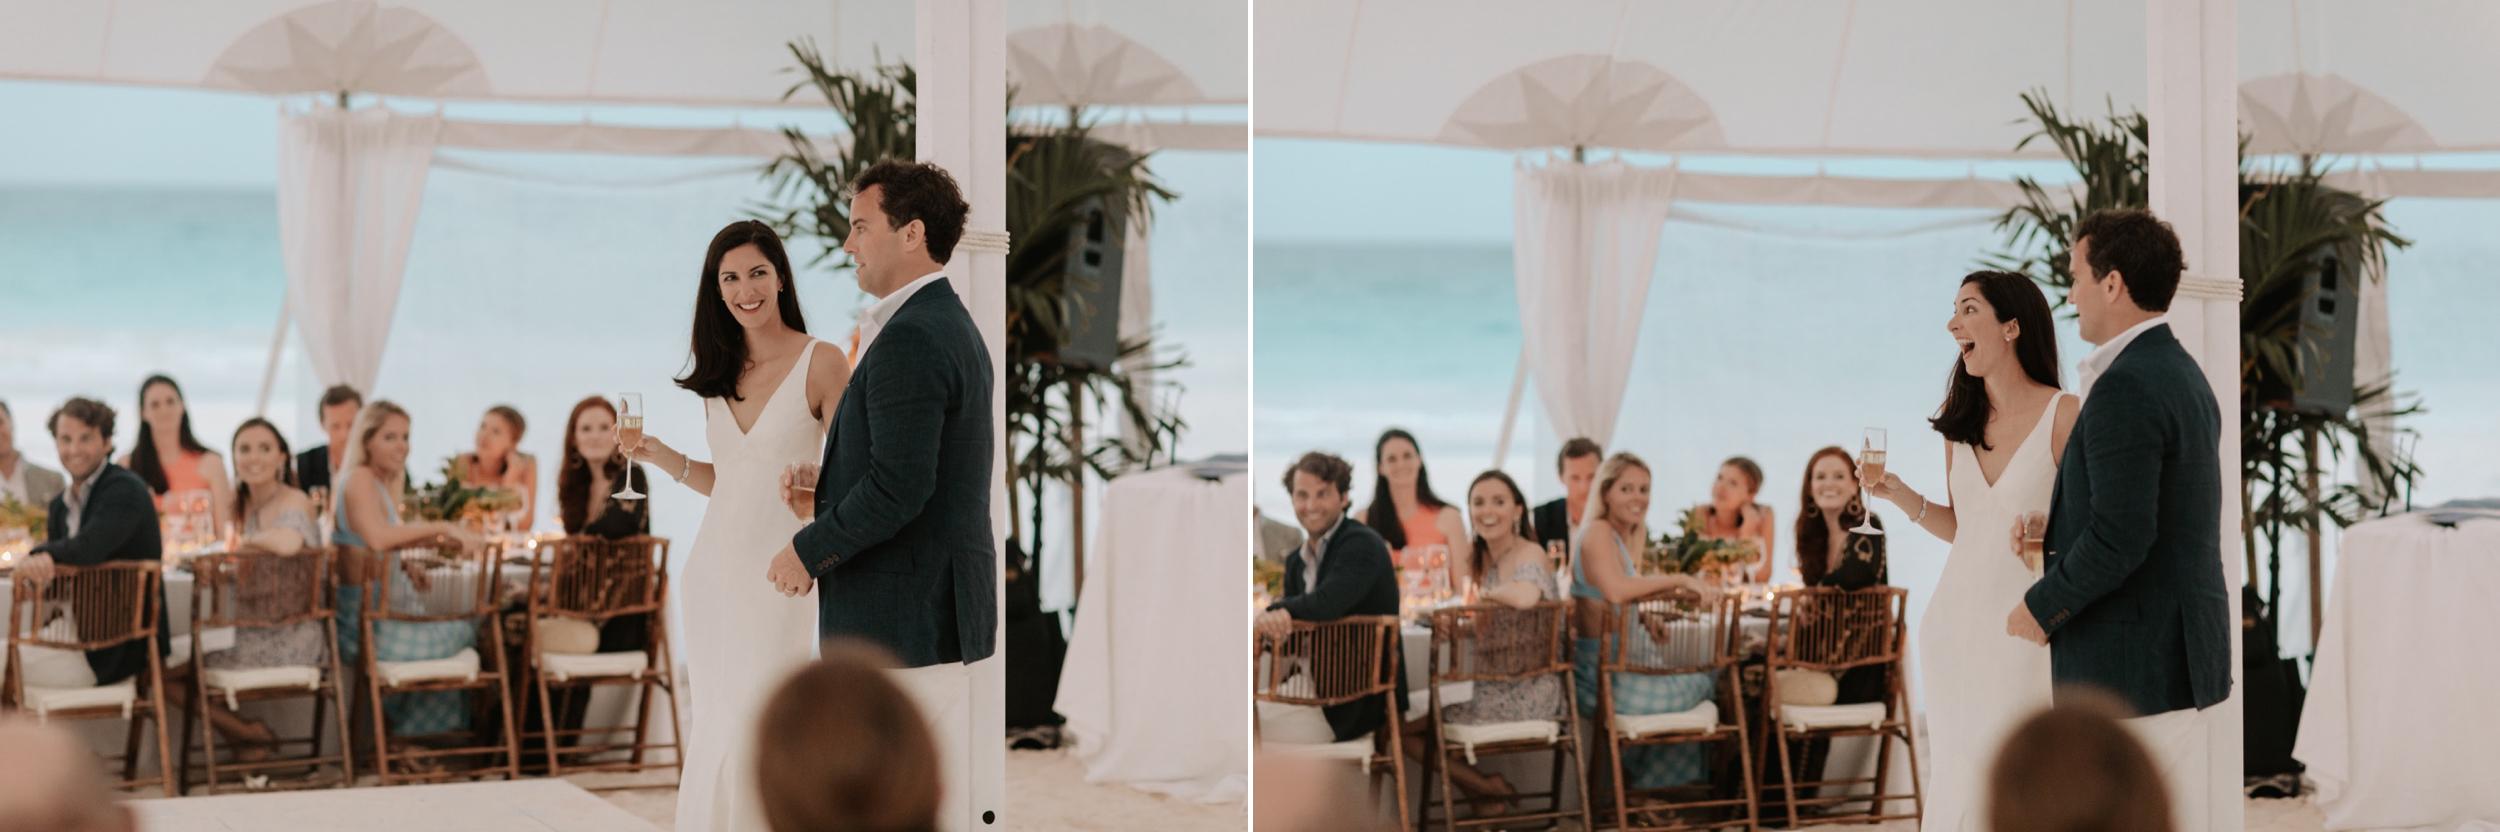 Harbour-Island-Ocean-View-Club-Wedding-Photographer_76.jpg